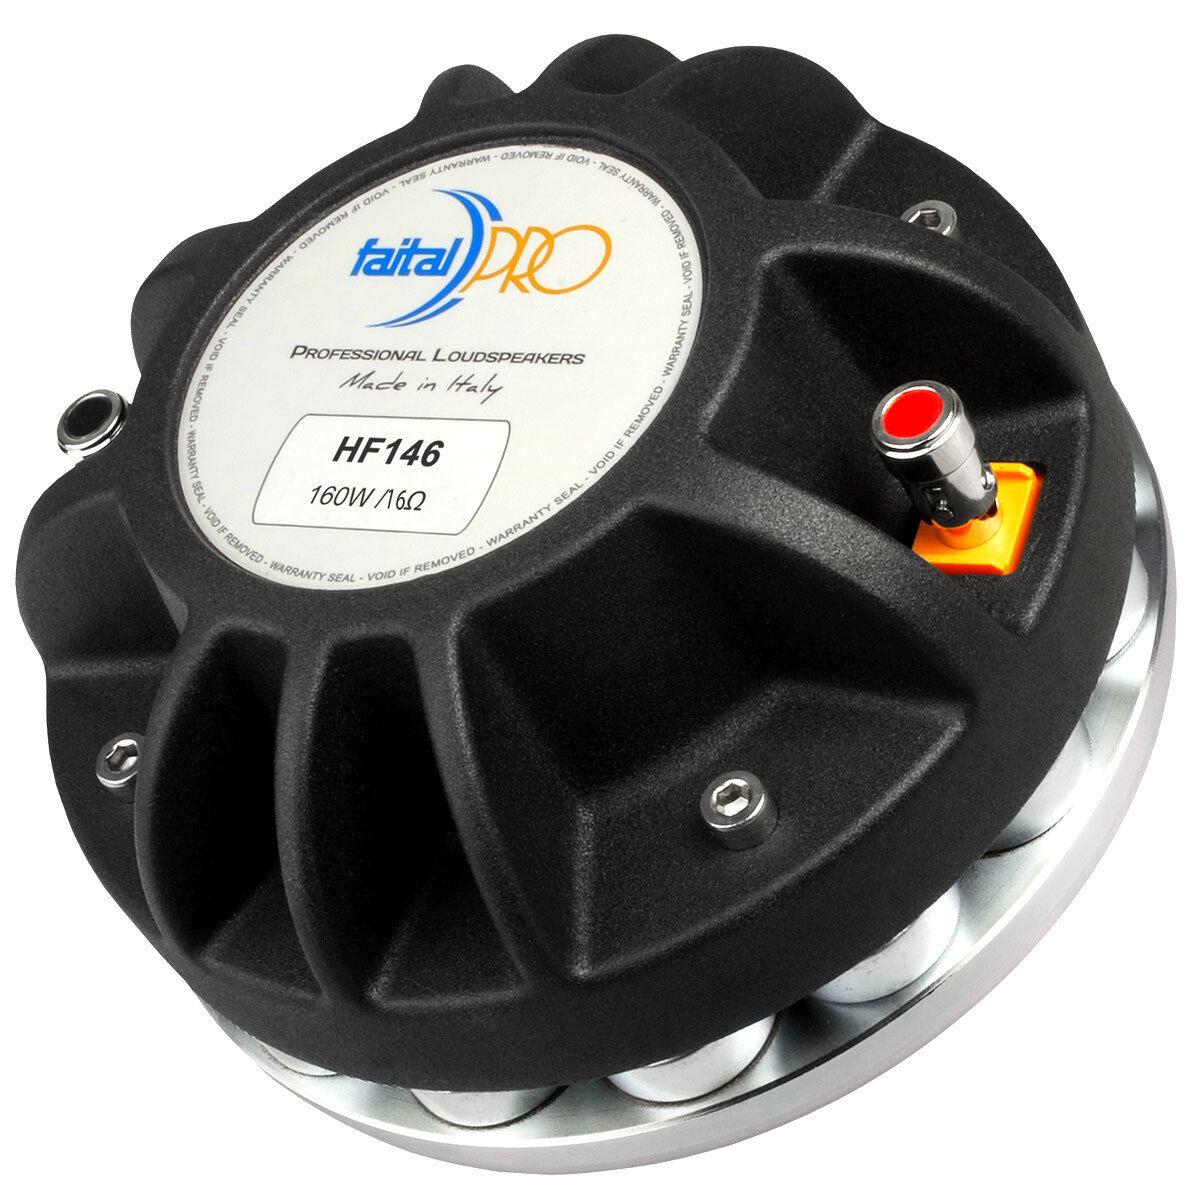 FAITAL PRO HF146 1.4  Neodymium Tweeter Compression Horn Driver 16 Ohm 160W KP